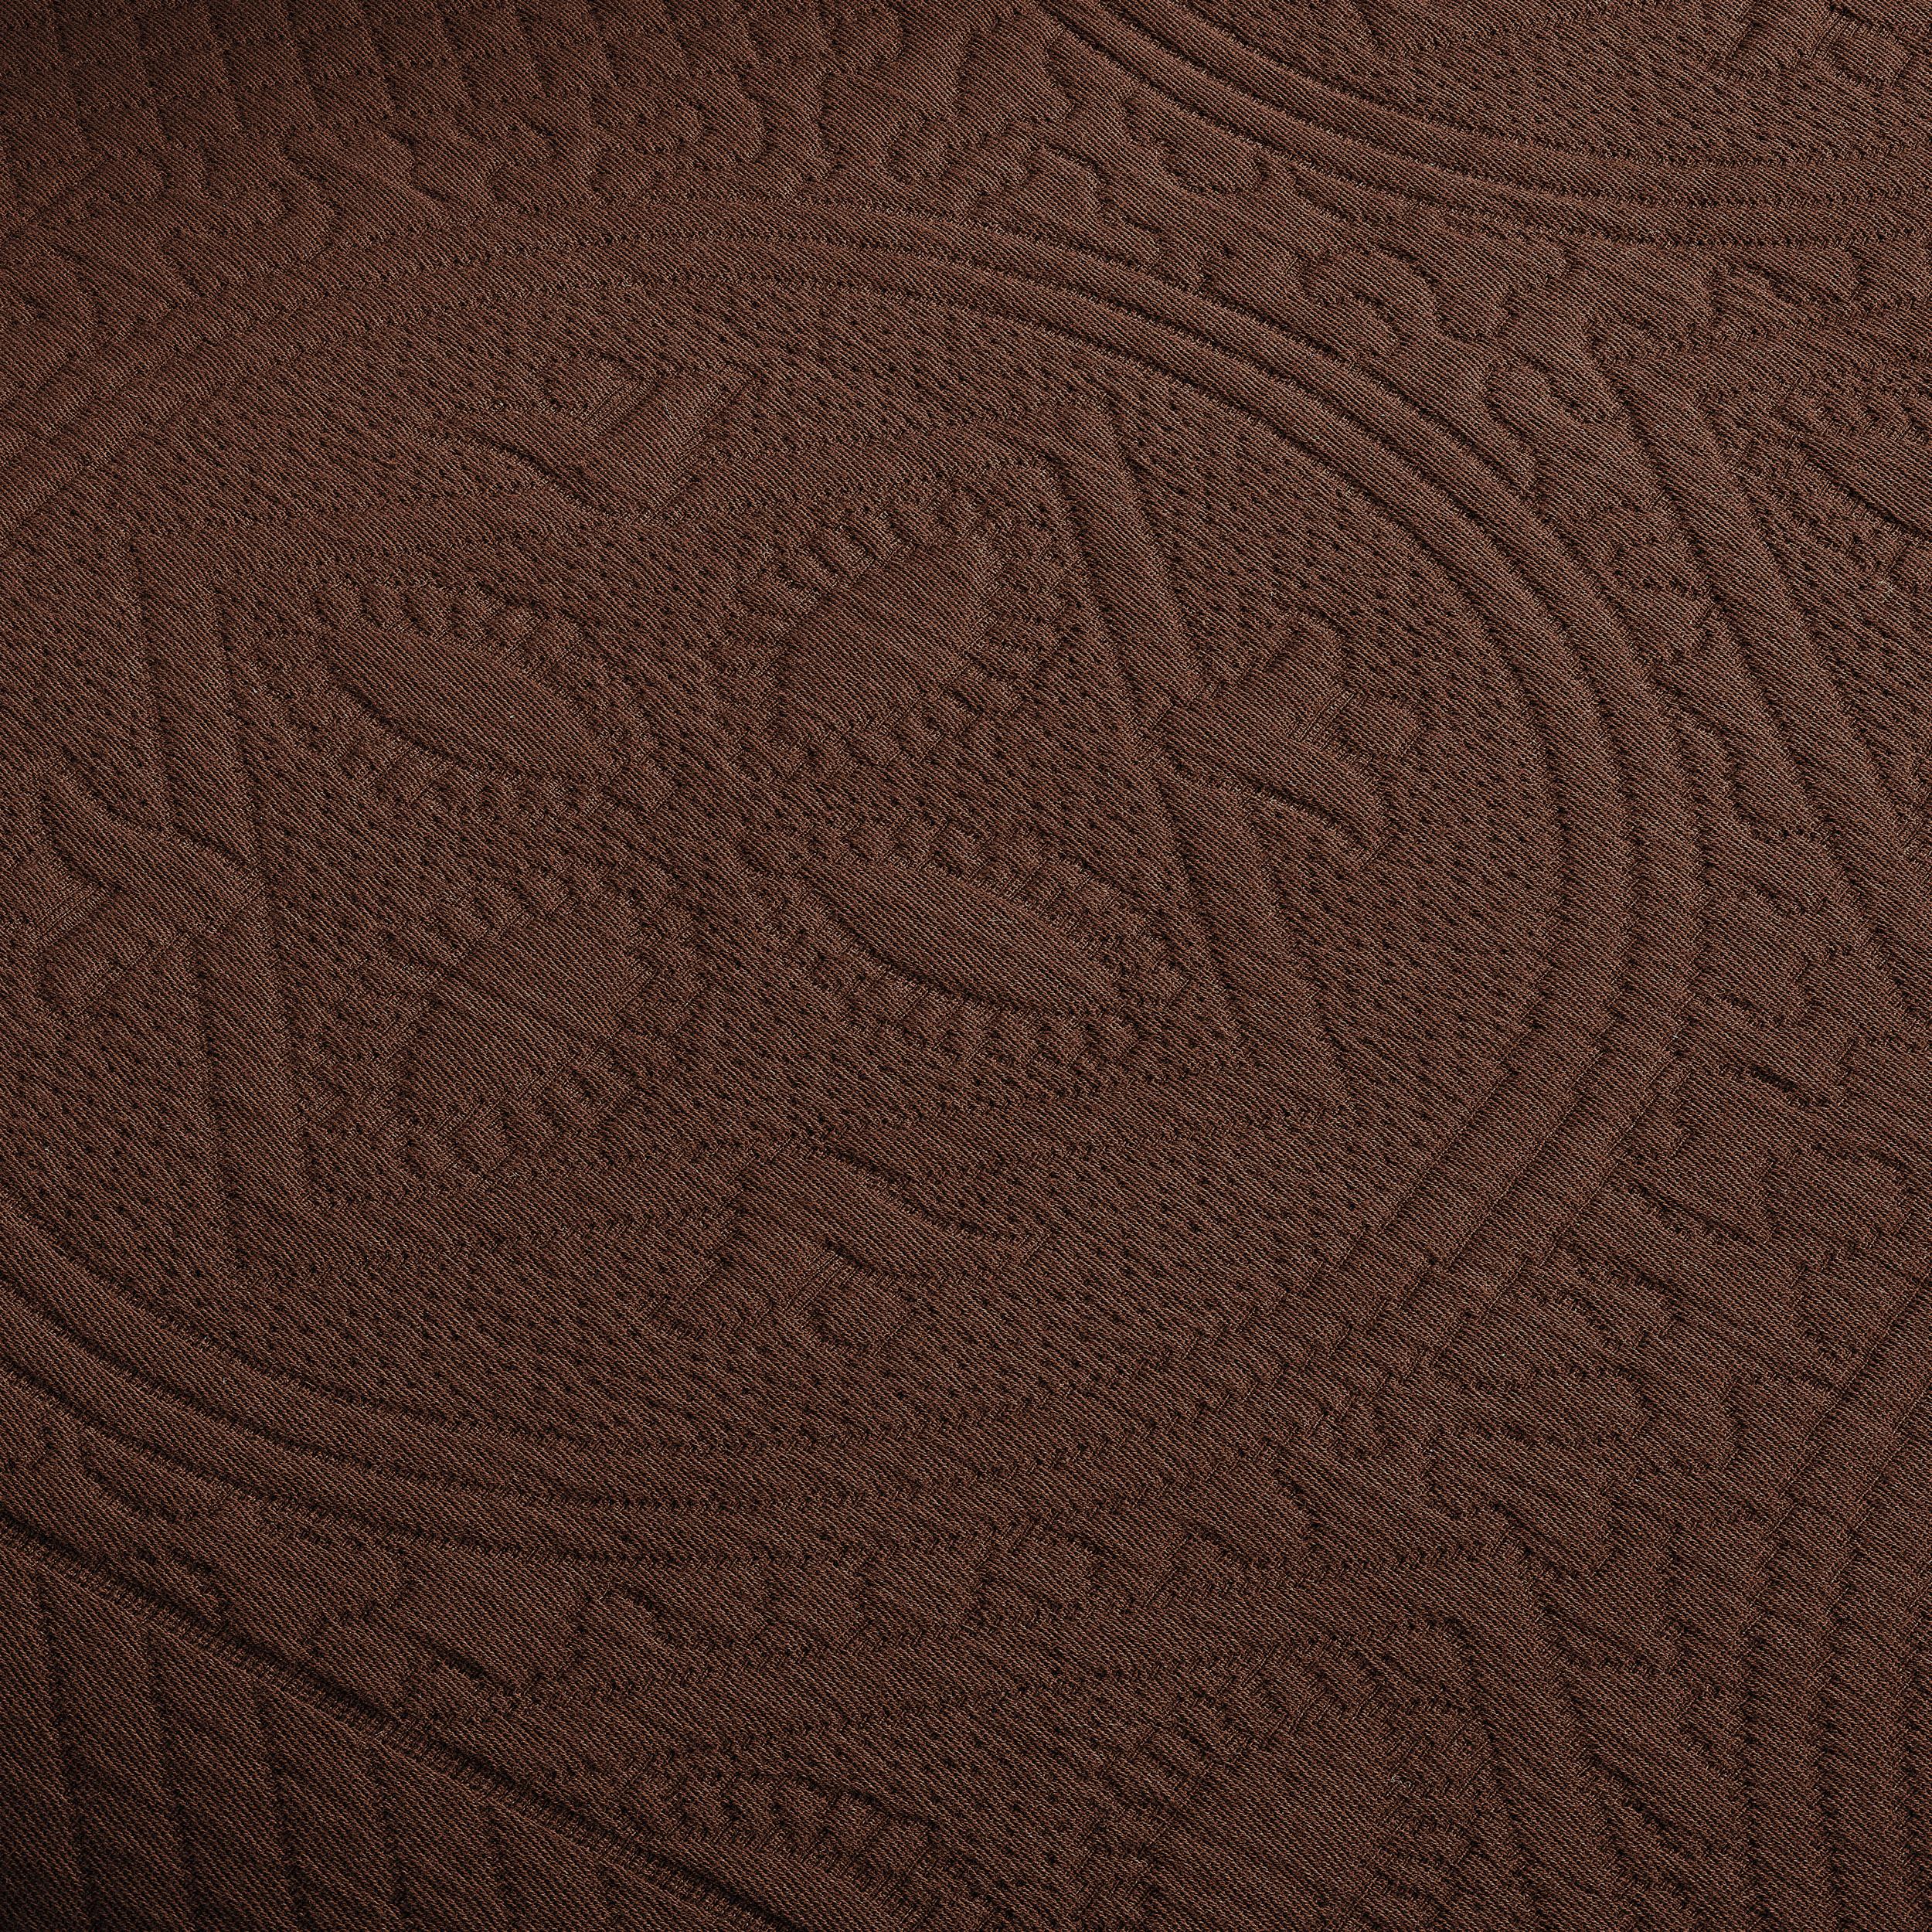 Celtic-Circle-Cotton-Jacquard-Matelasse-Scalloped-Bedspread-Set thumbnail 11